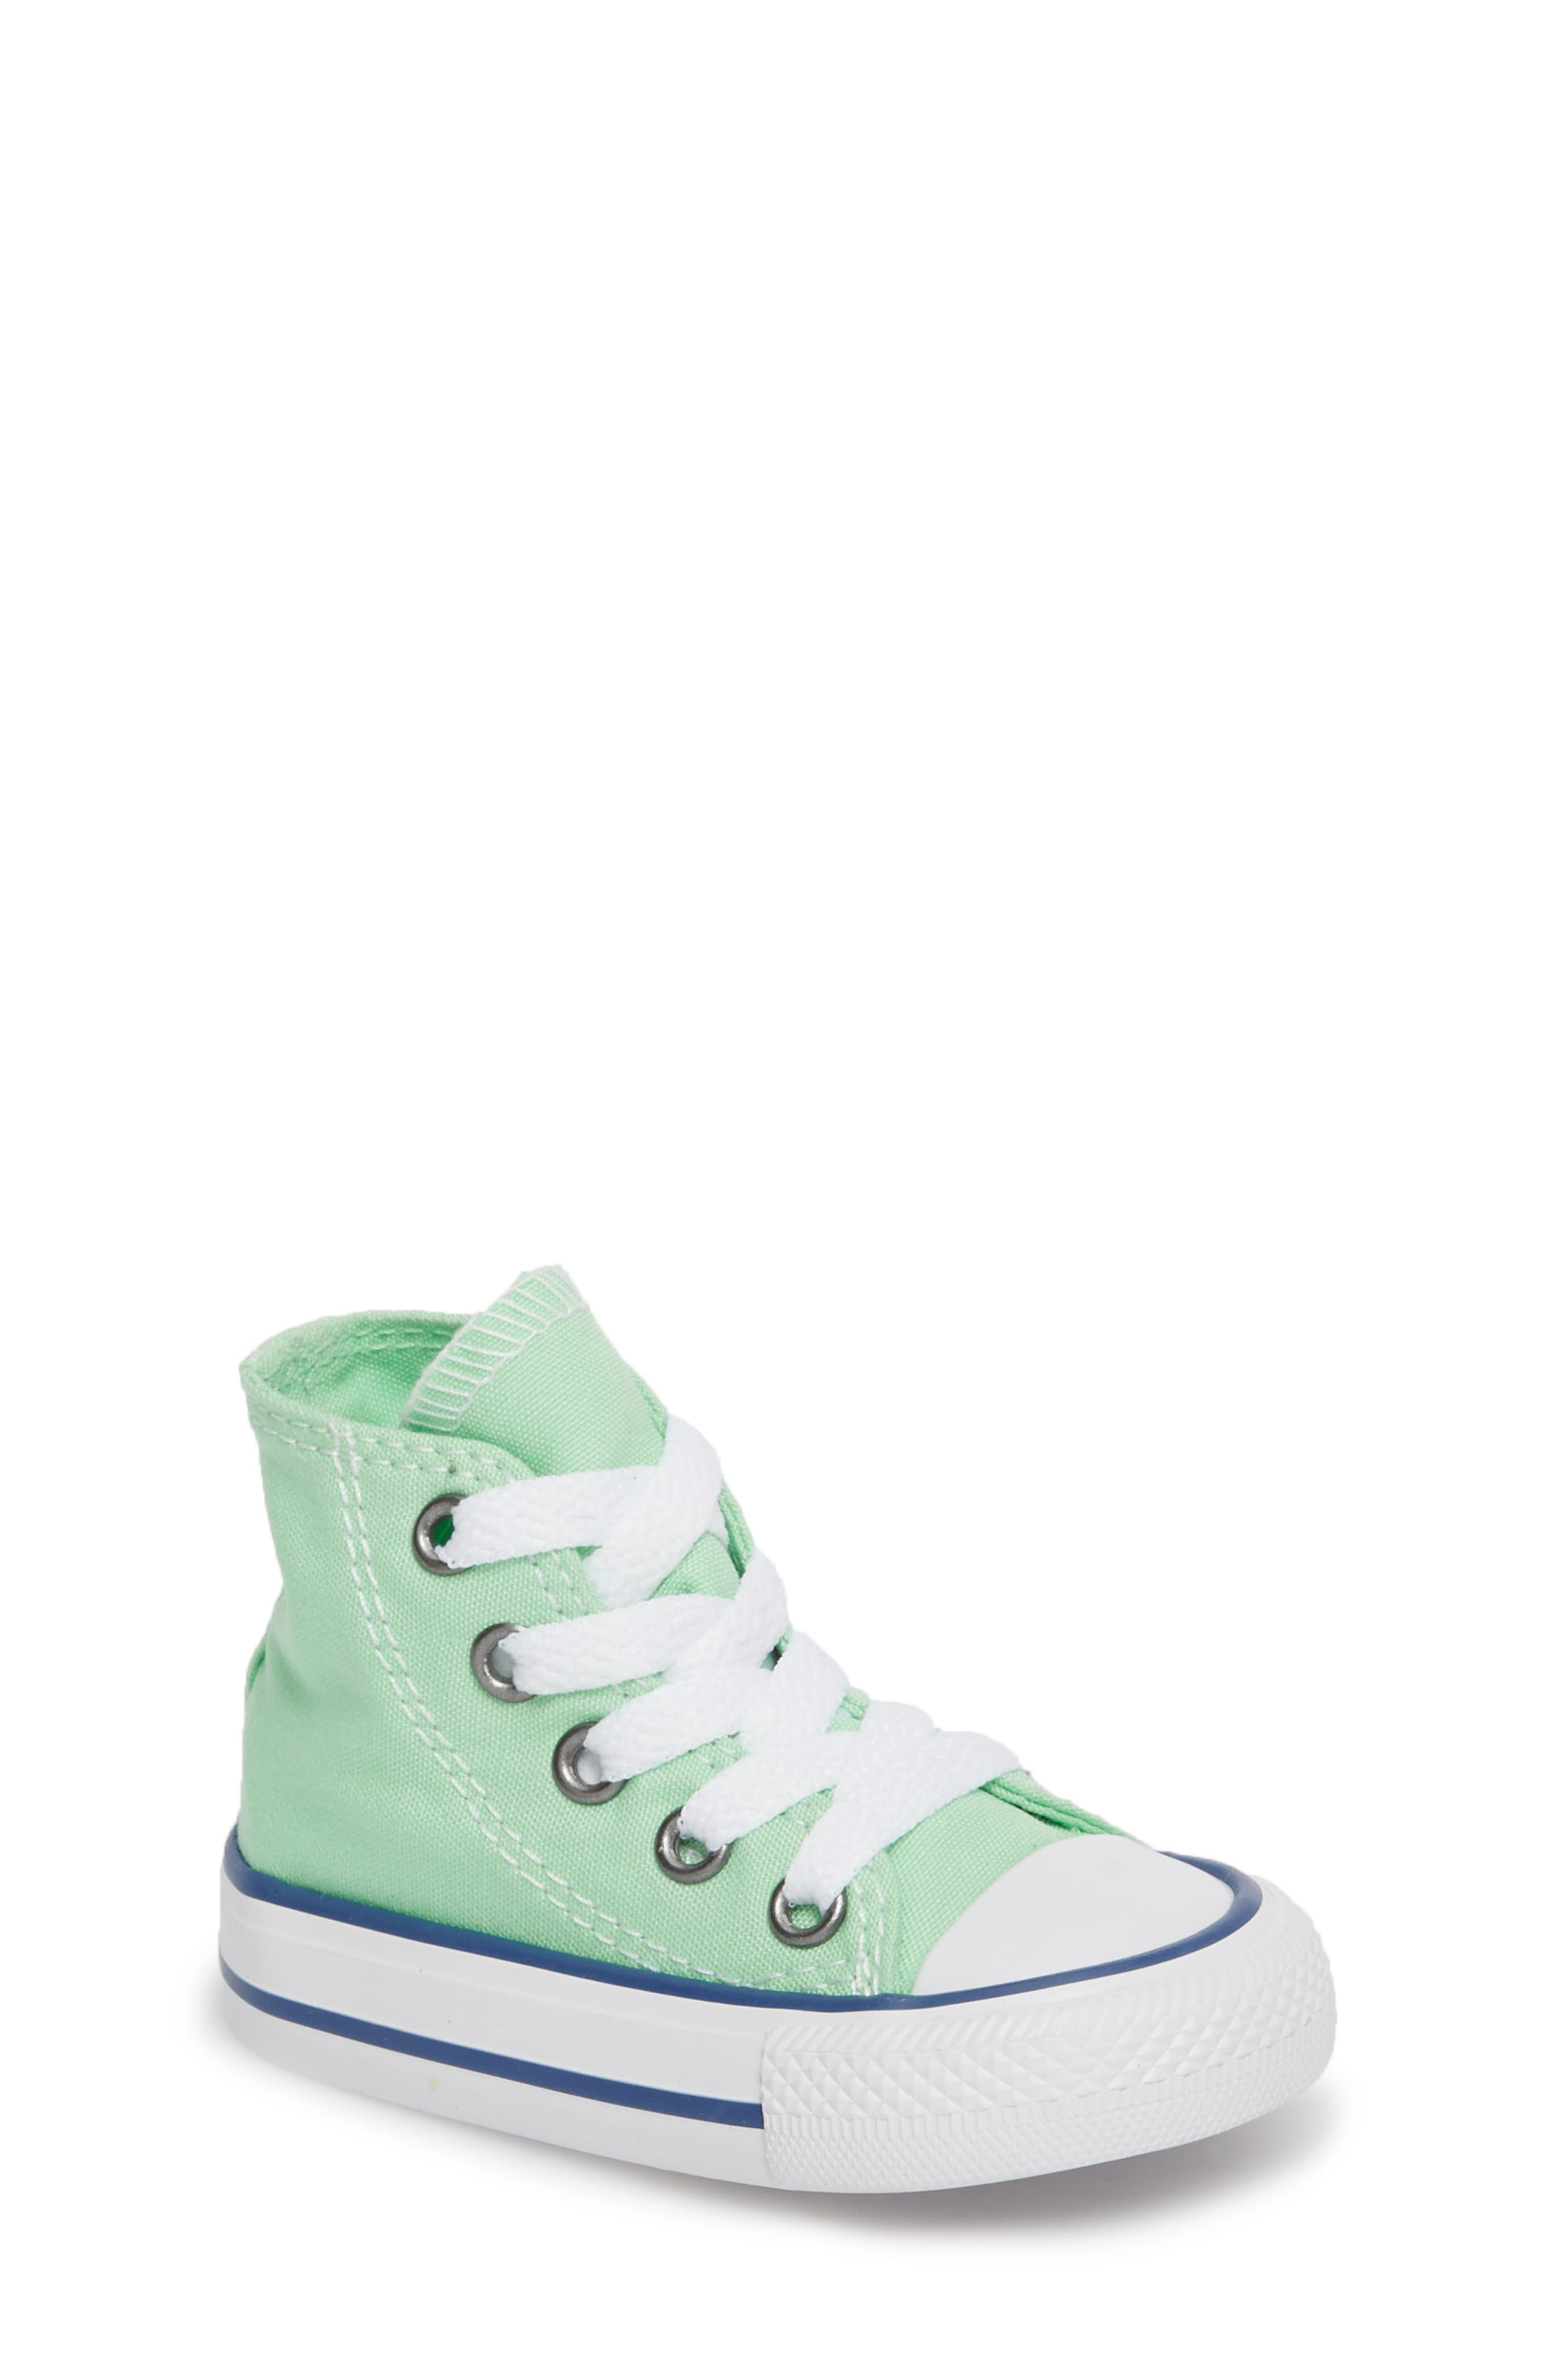 Chuck Taylor<sup>®</sup> All Star<sup>®</sup> Seasonal High Top Sneaker,                             Main thumbnail 1, color,                             336